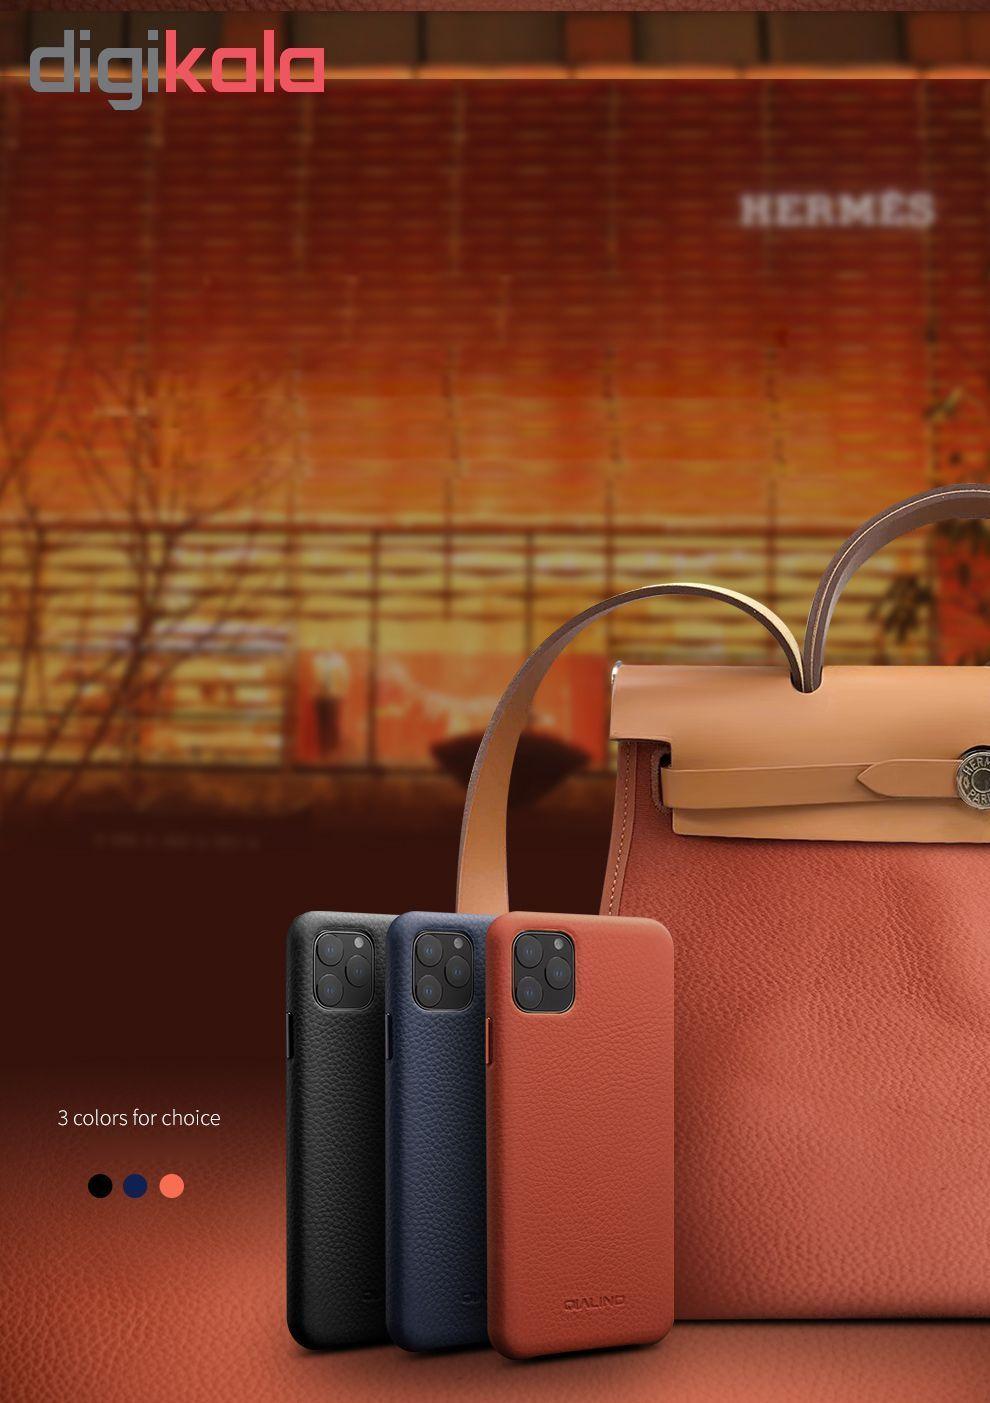 کاور کیالینو مدل LE1 مناسب برای گوشی موبایل اپل iphone 11 pro max main 1 2